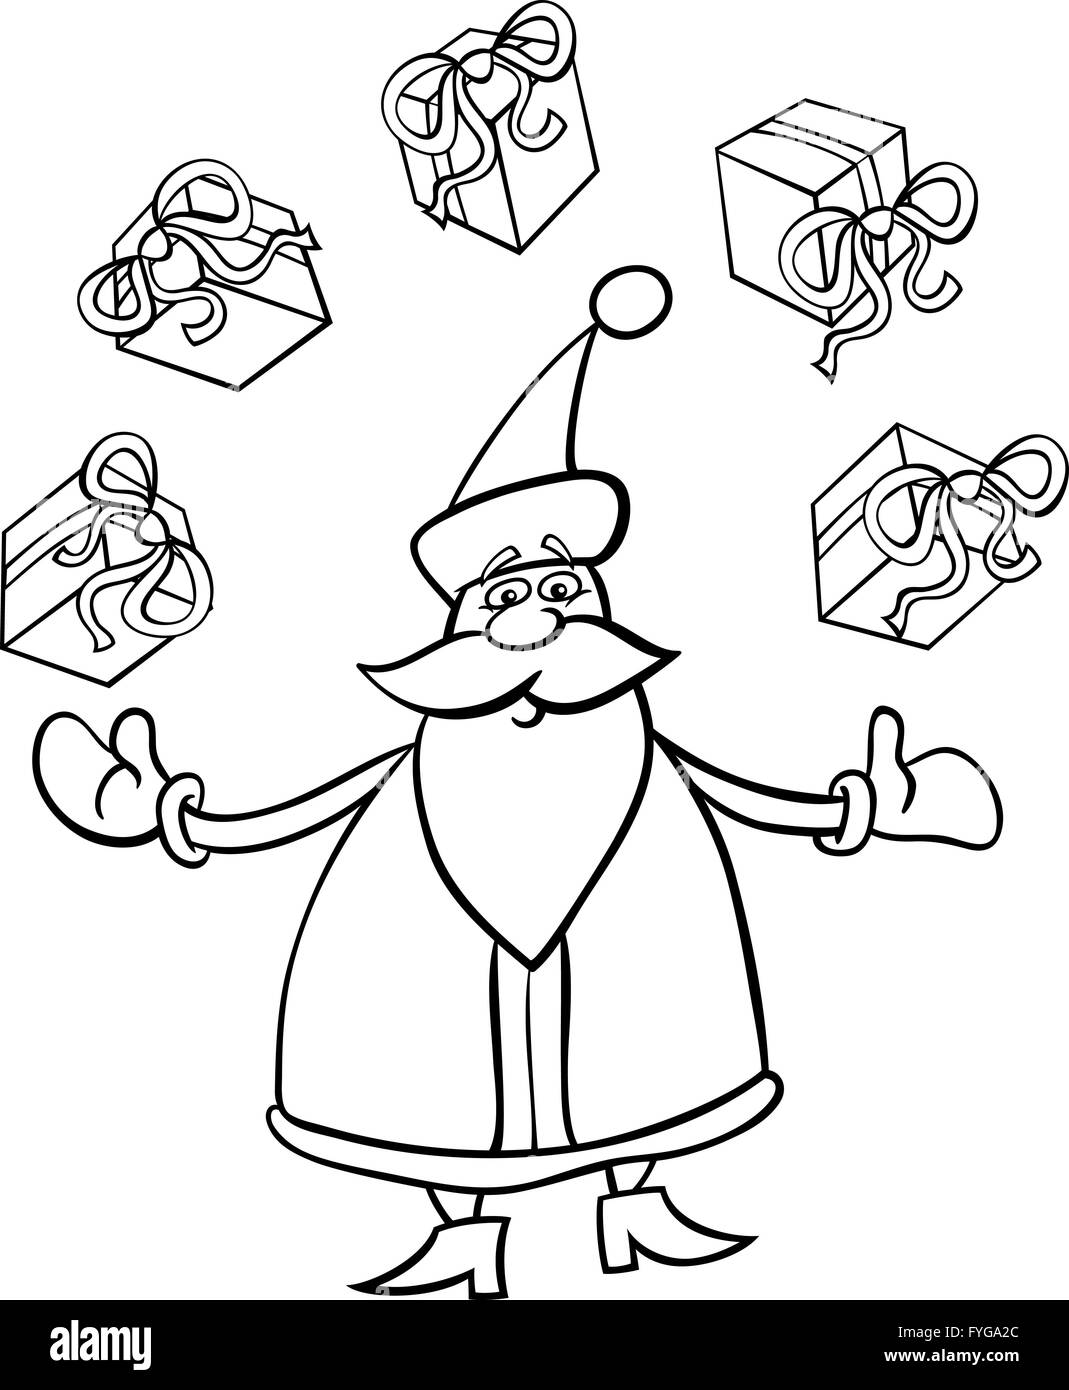 Santa Claus Cartoon For Coloring Stock Photo 103006692 Alamy